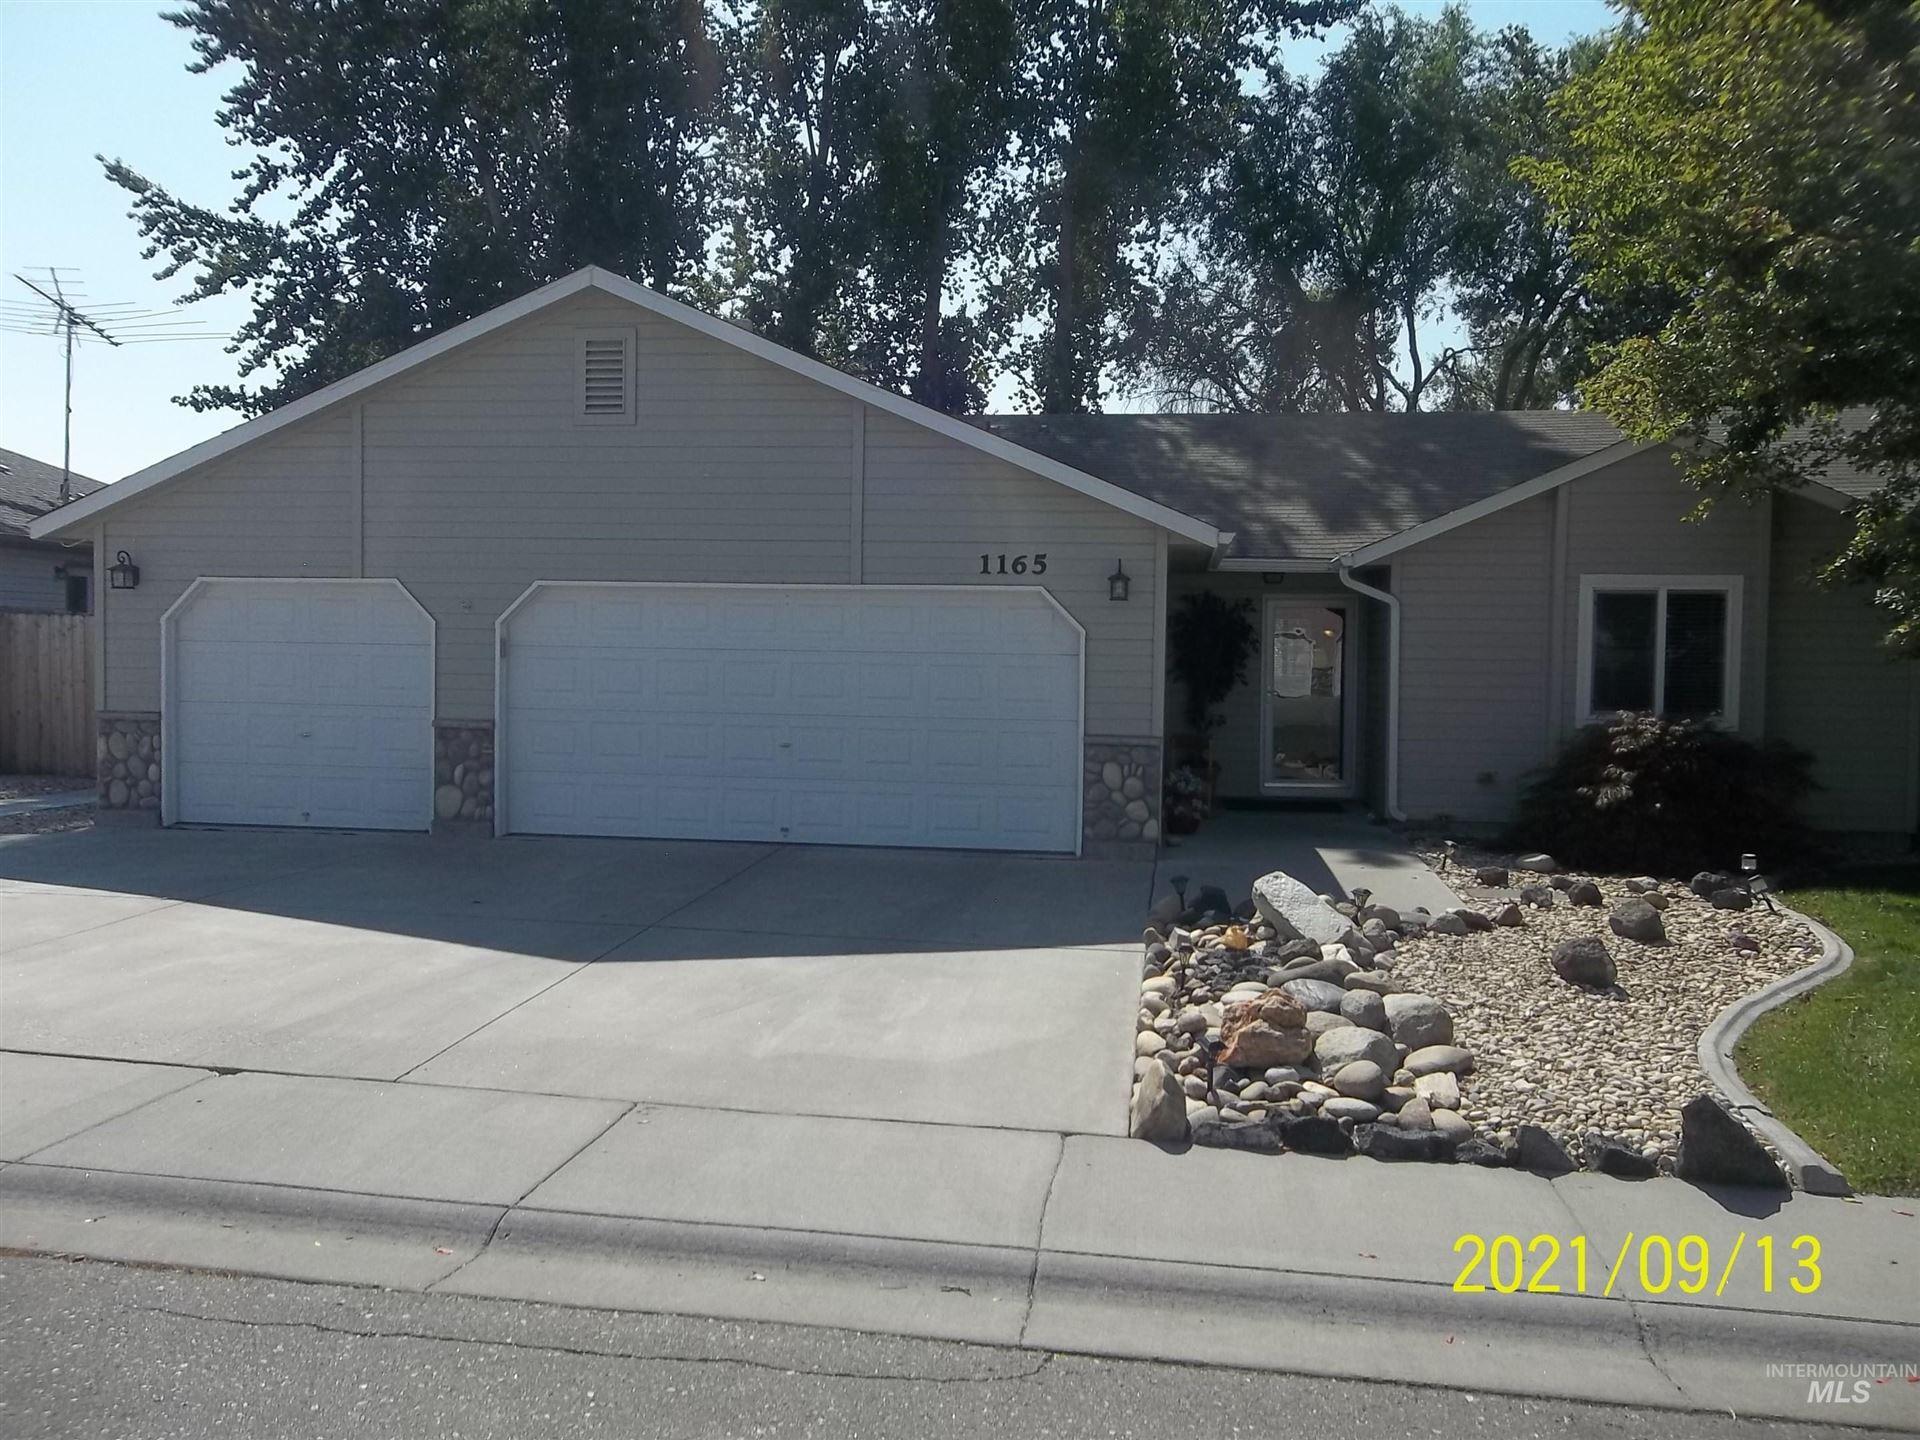 1165 E 19th North, Mountain Home, ID 83647 - MLS#: 98818777